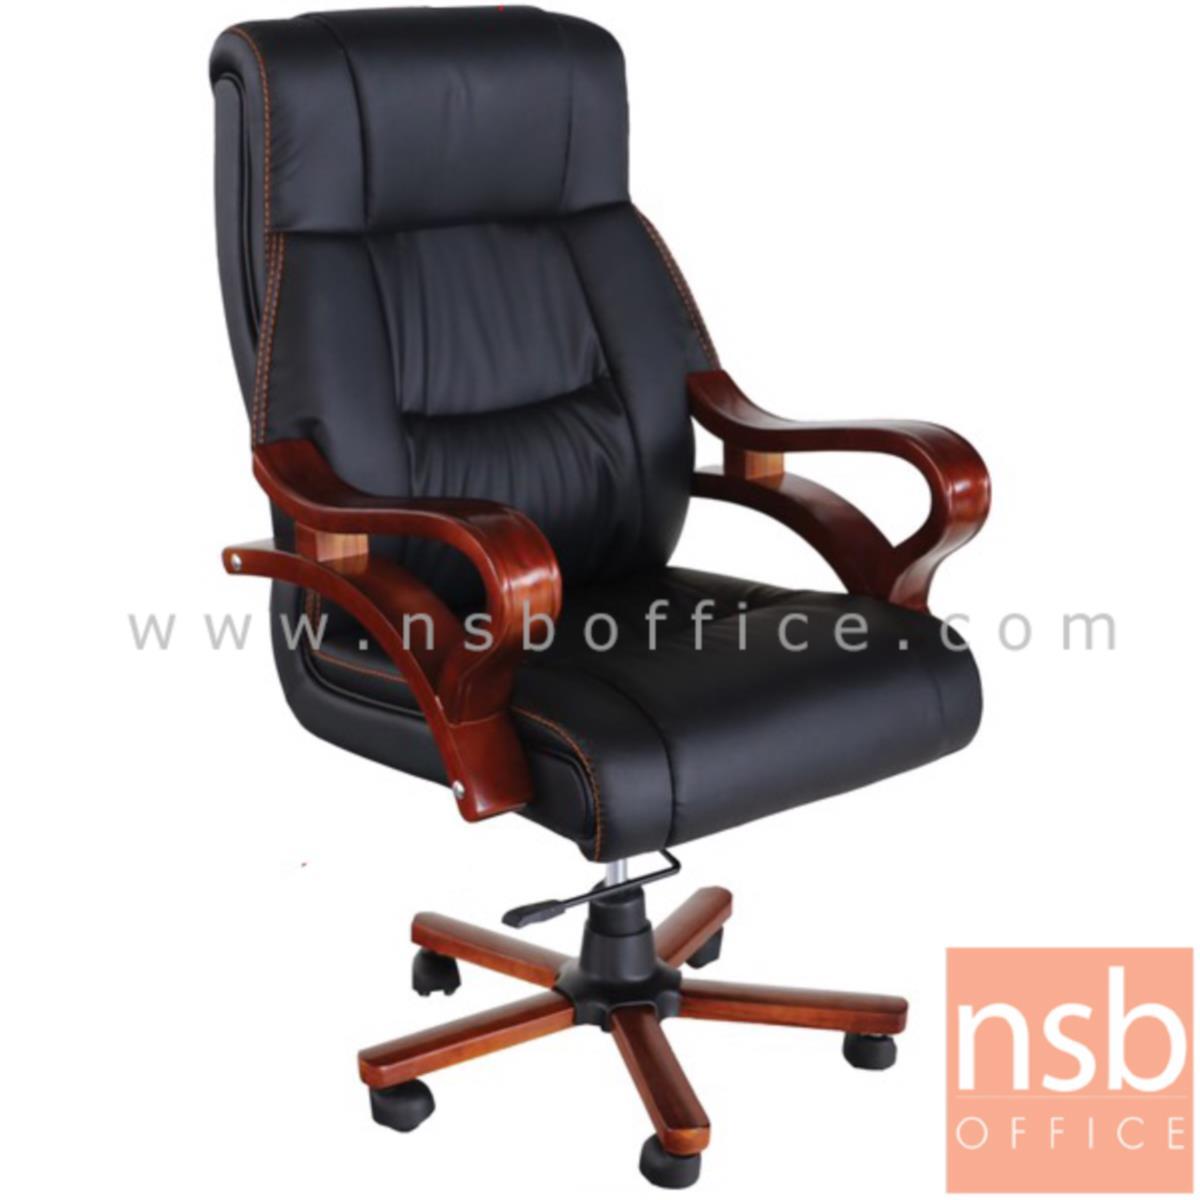 B25A096:เก้าอี้ผู้บริหารหนัง PU รุ่น Lydon (ไลดอน)  โช๊คแก๊ส มีก้อนโยก ขาไม้